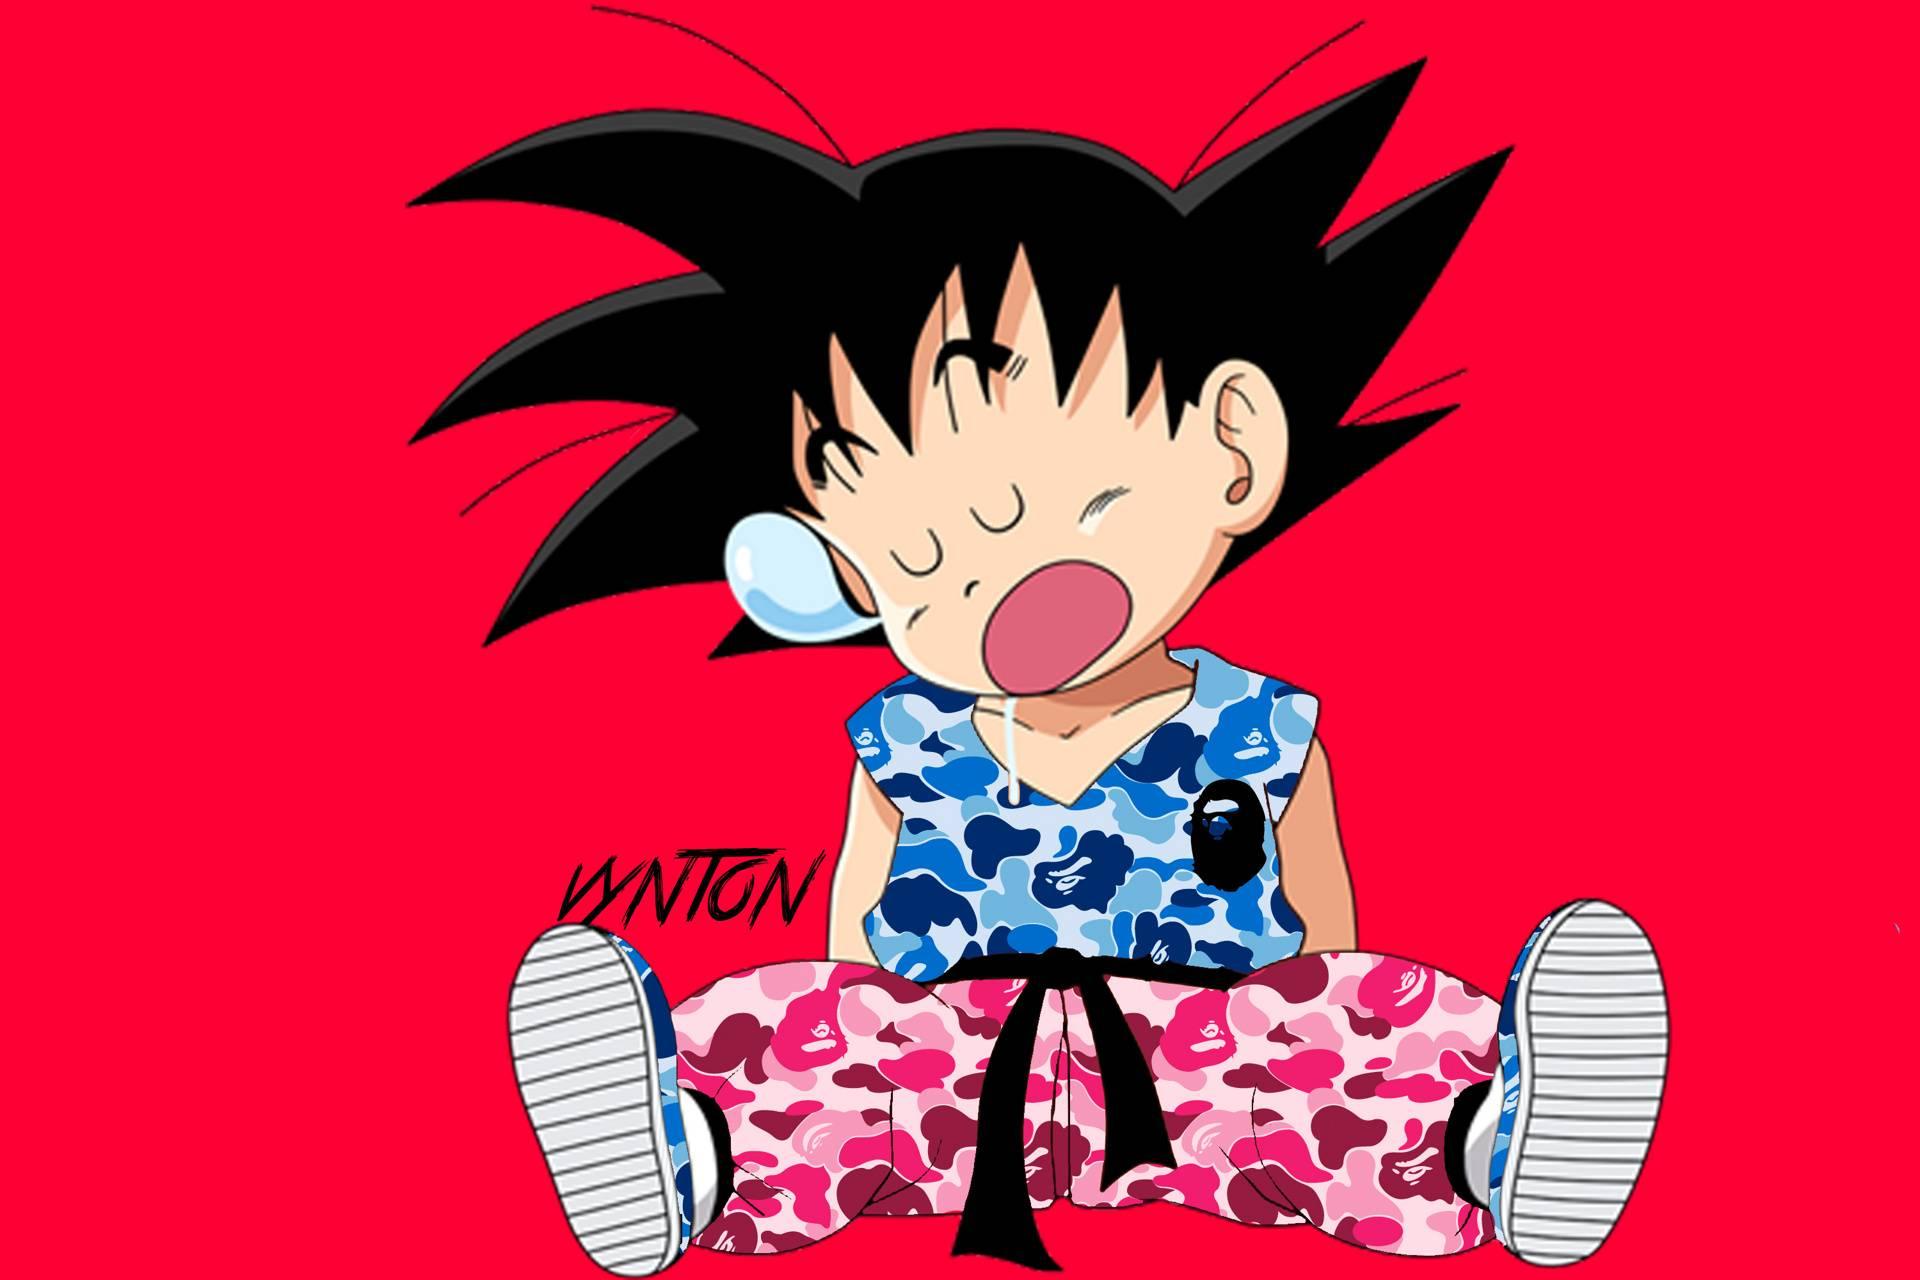 Baby Goku Wallpapers Top Free Baby Goku Backgrounds Wallpaperaccess